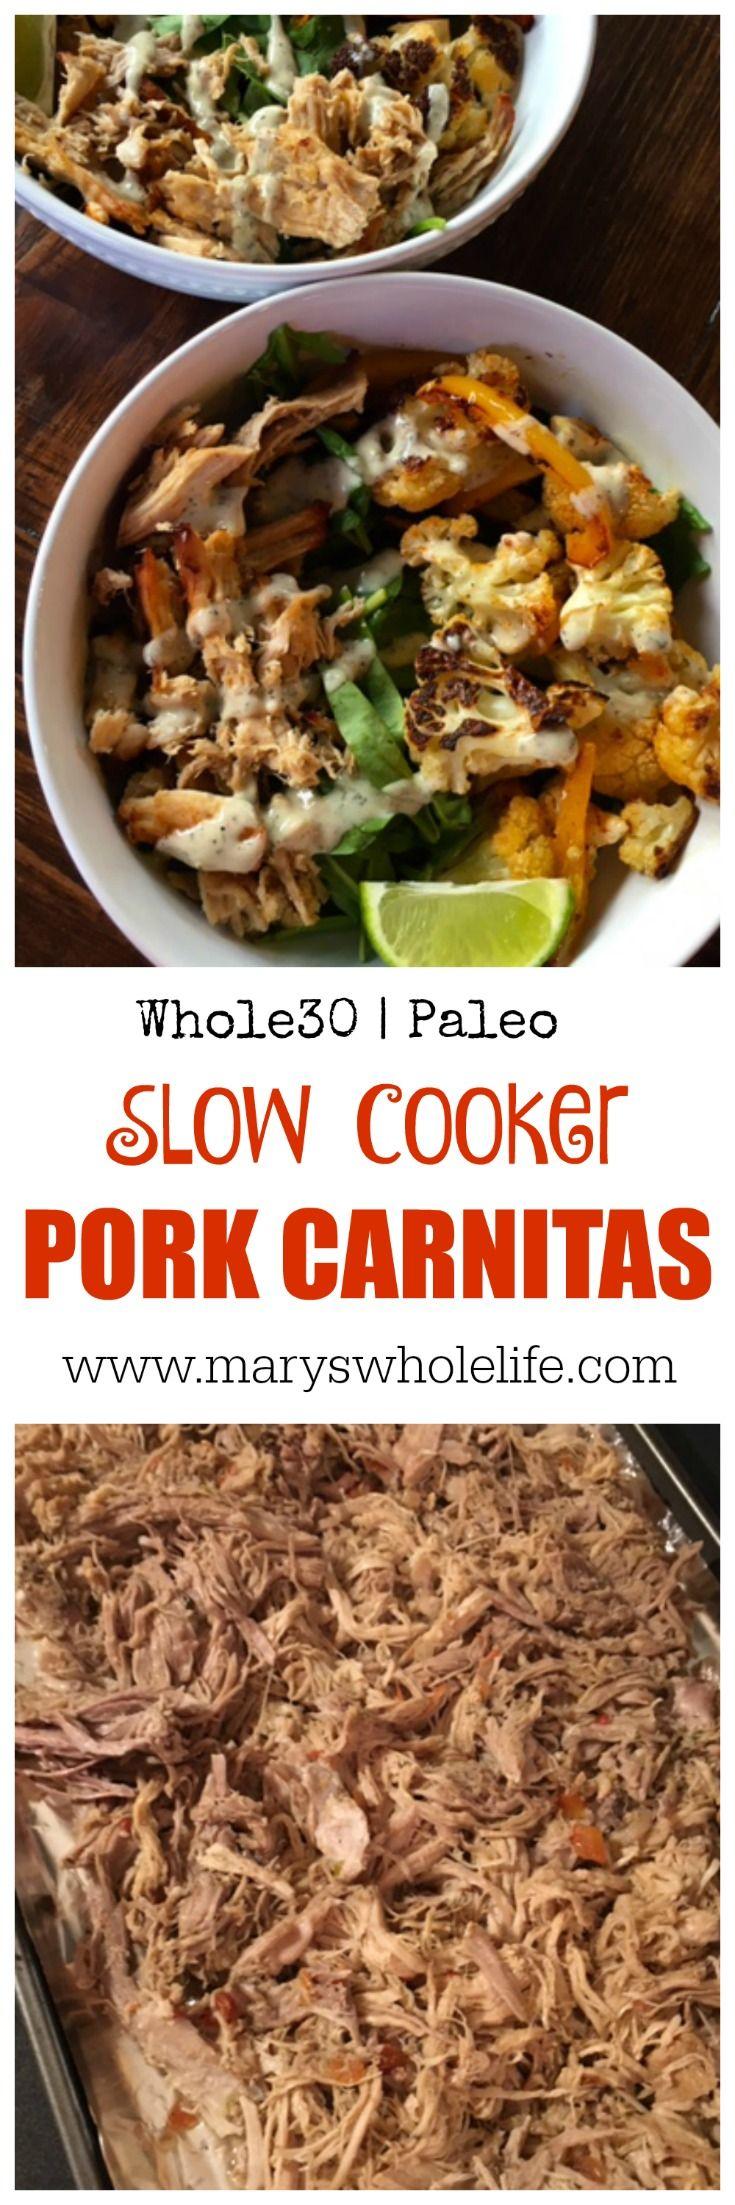 Whole30 Slow Cooker (Crock Pot) Pork Carnitas!